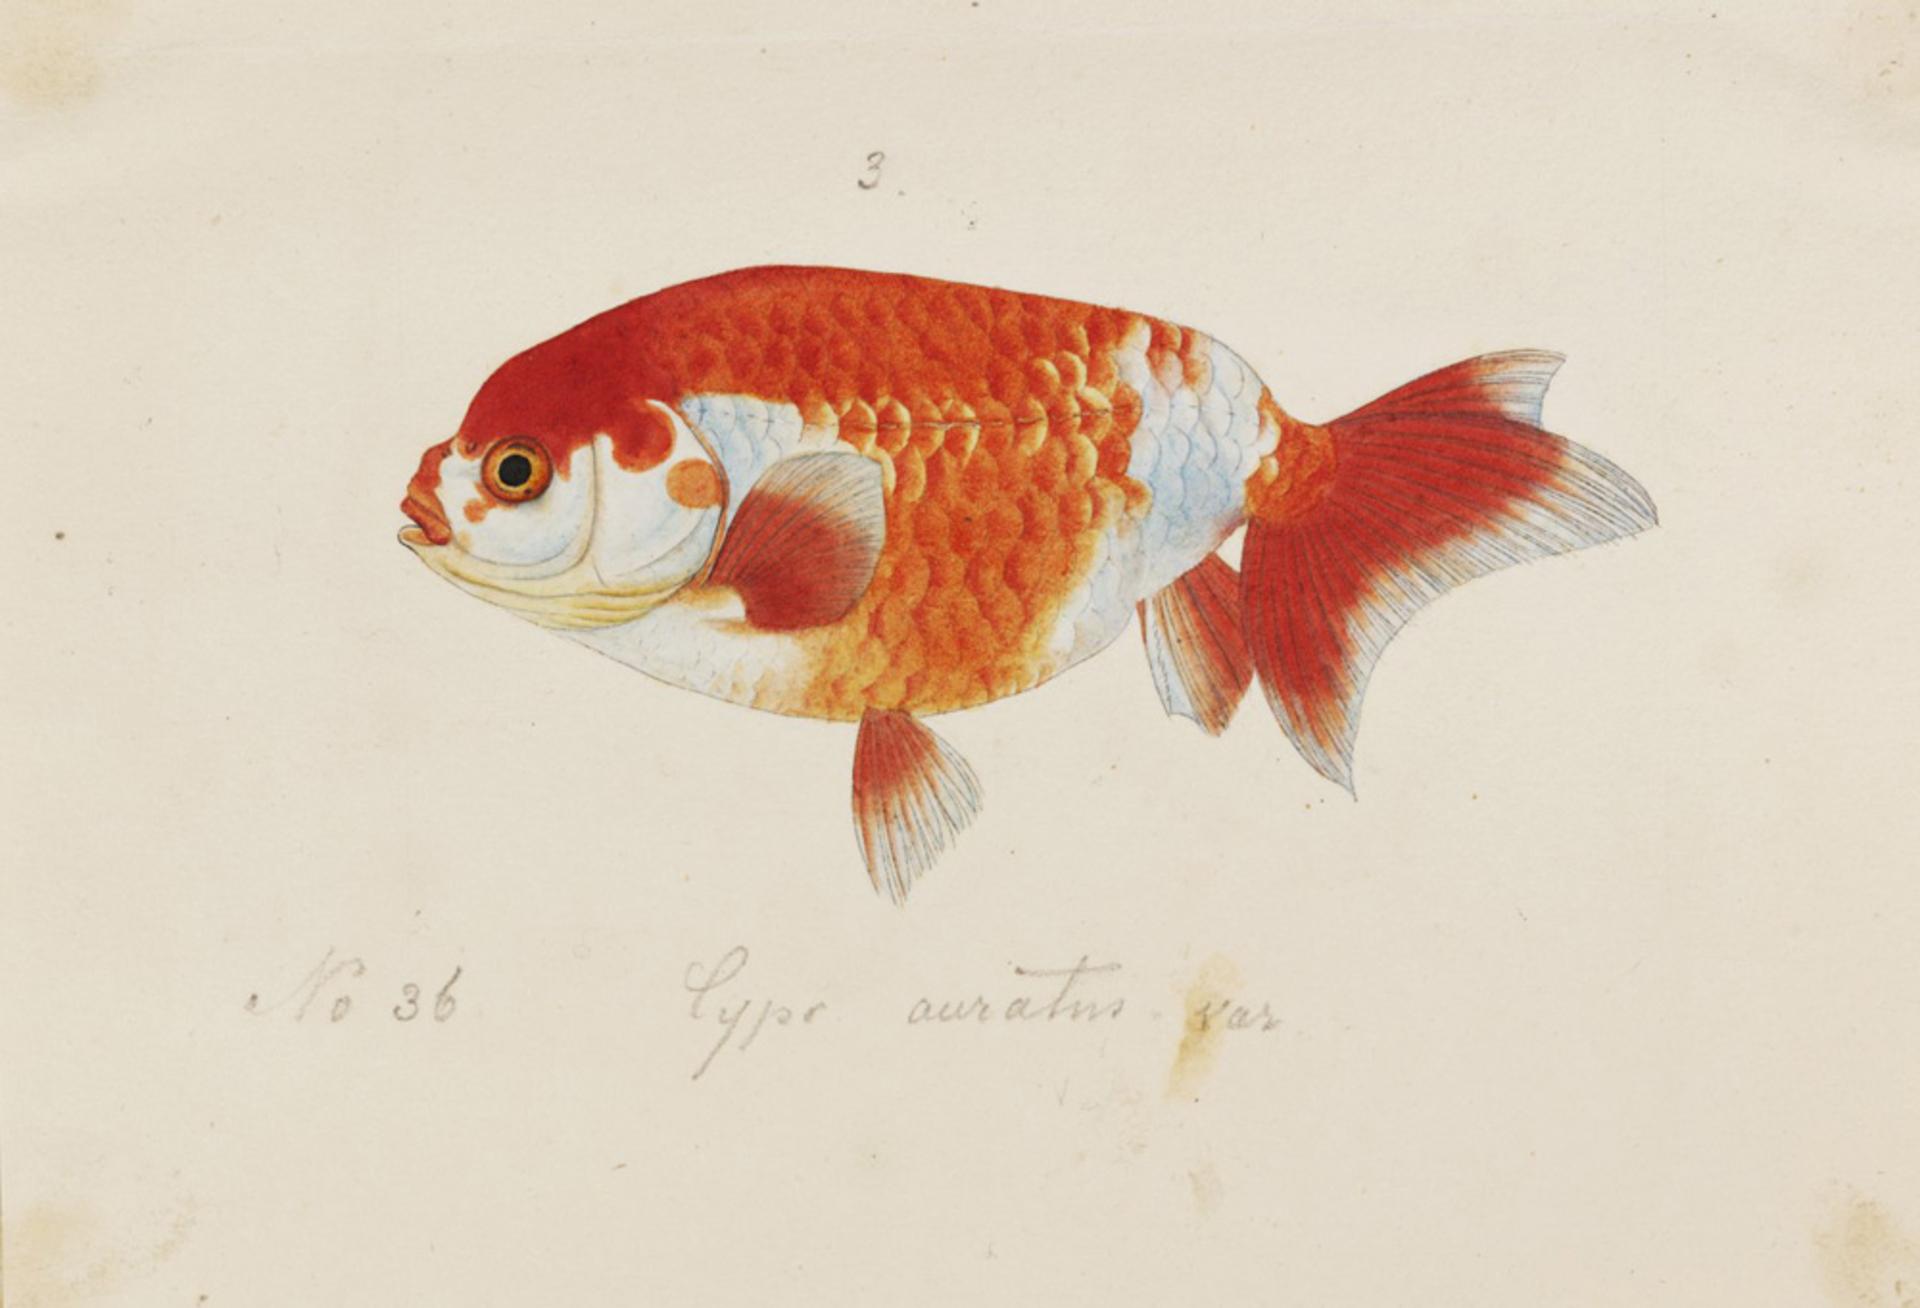 RMNH.ART.269 | Carassius auratus var. Osaka-Ranchu